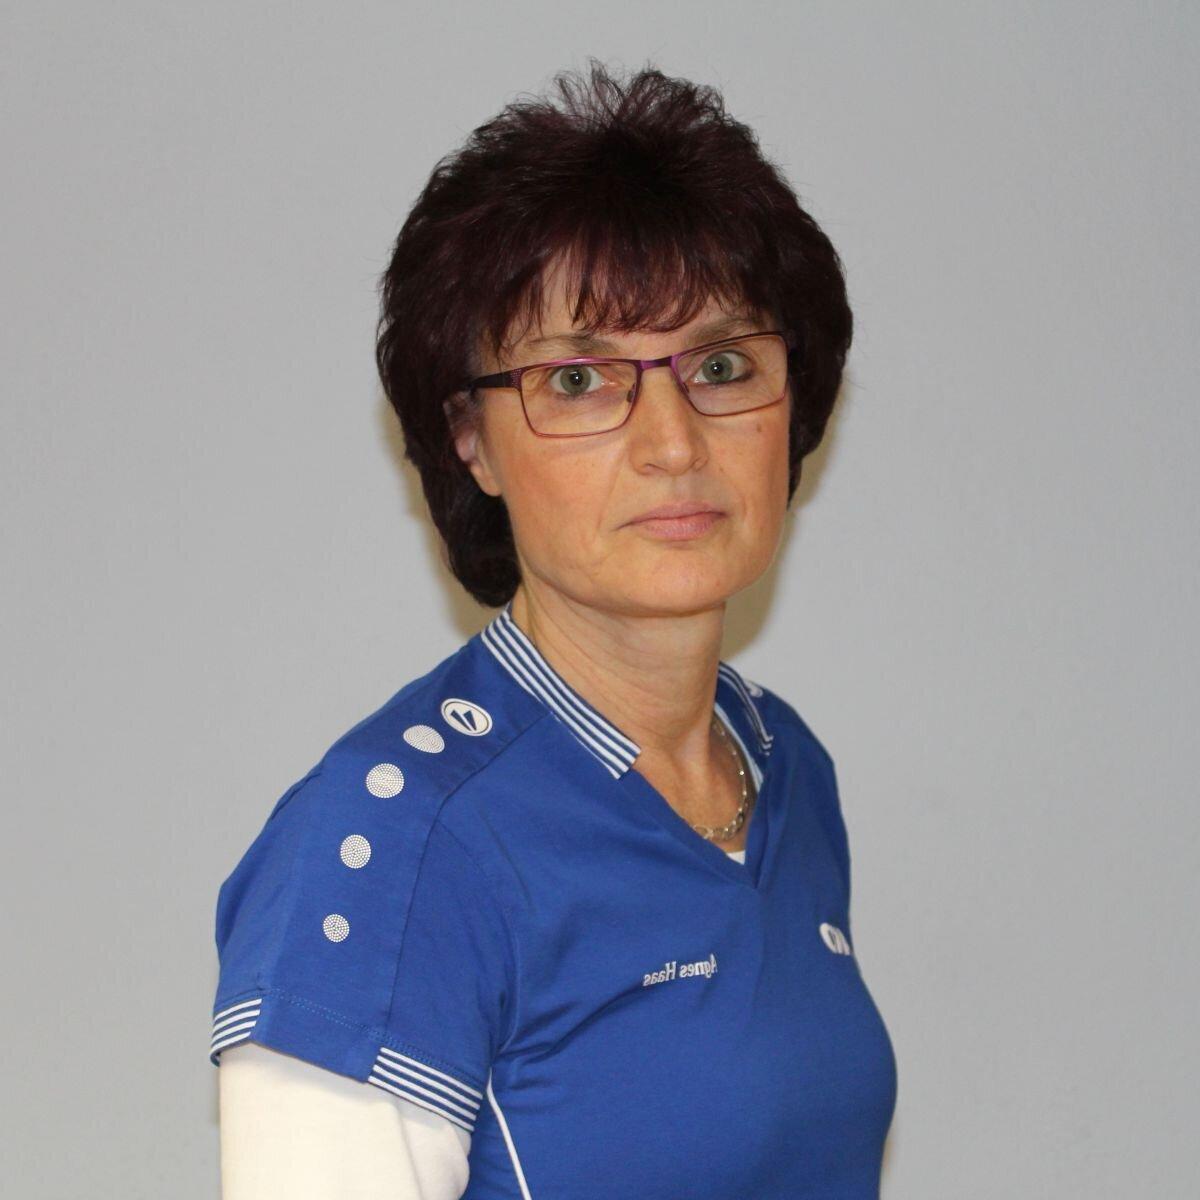 Agnes Haas